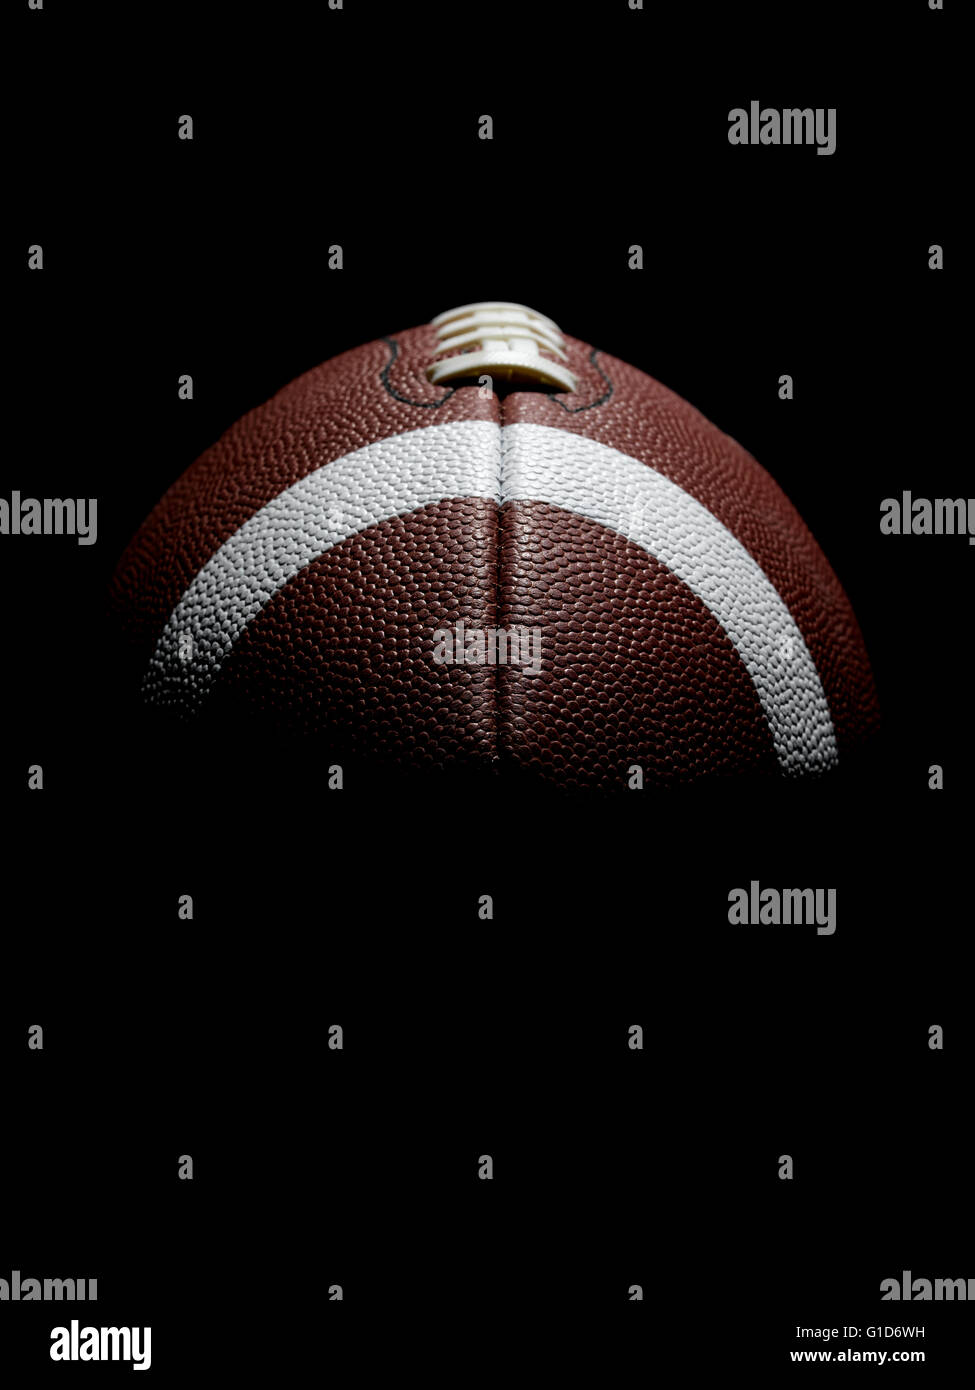 American Football on Black - Stock Image